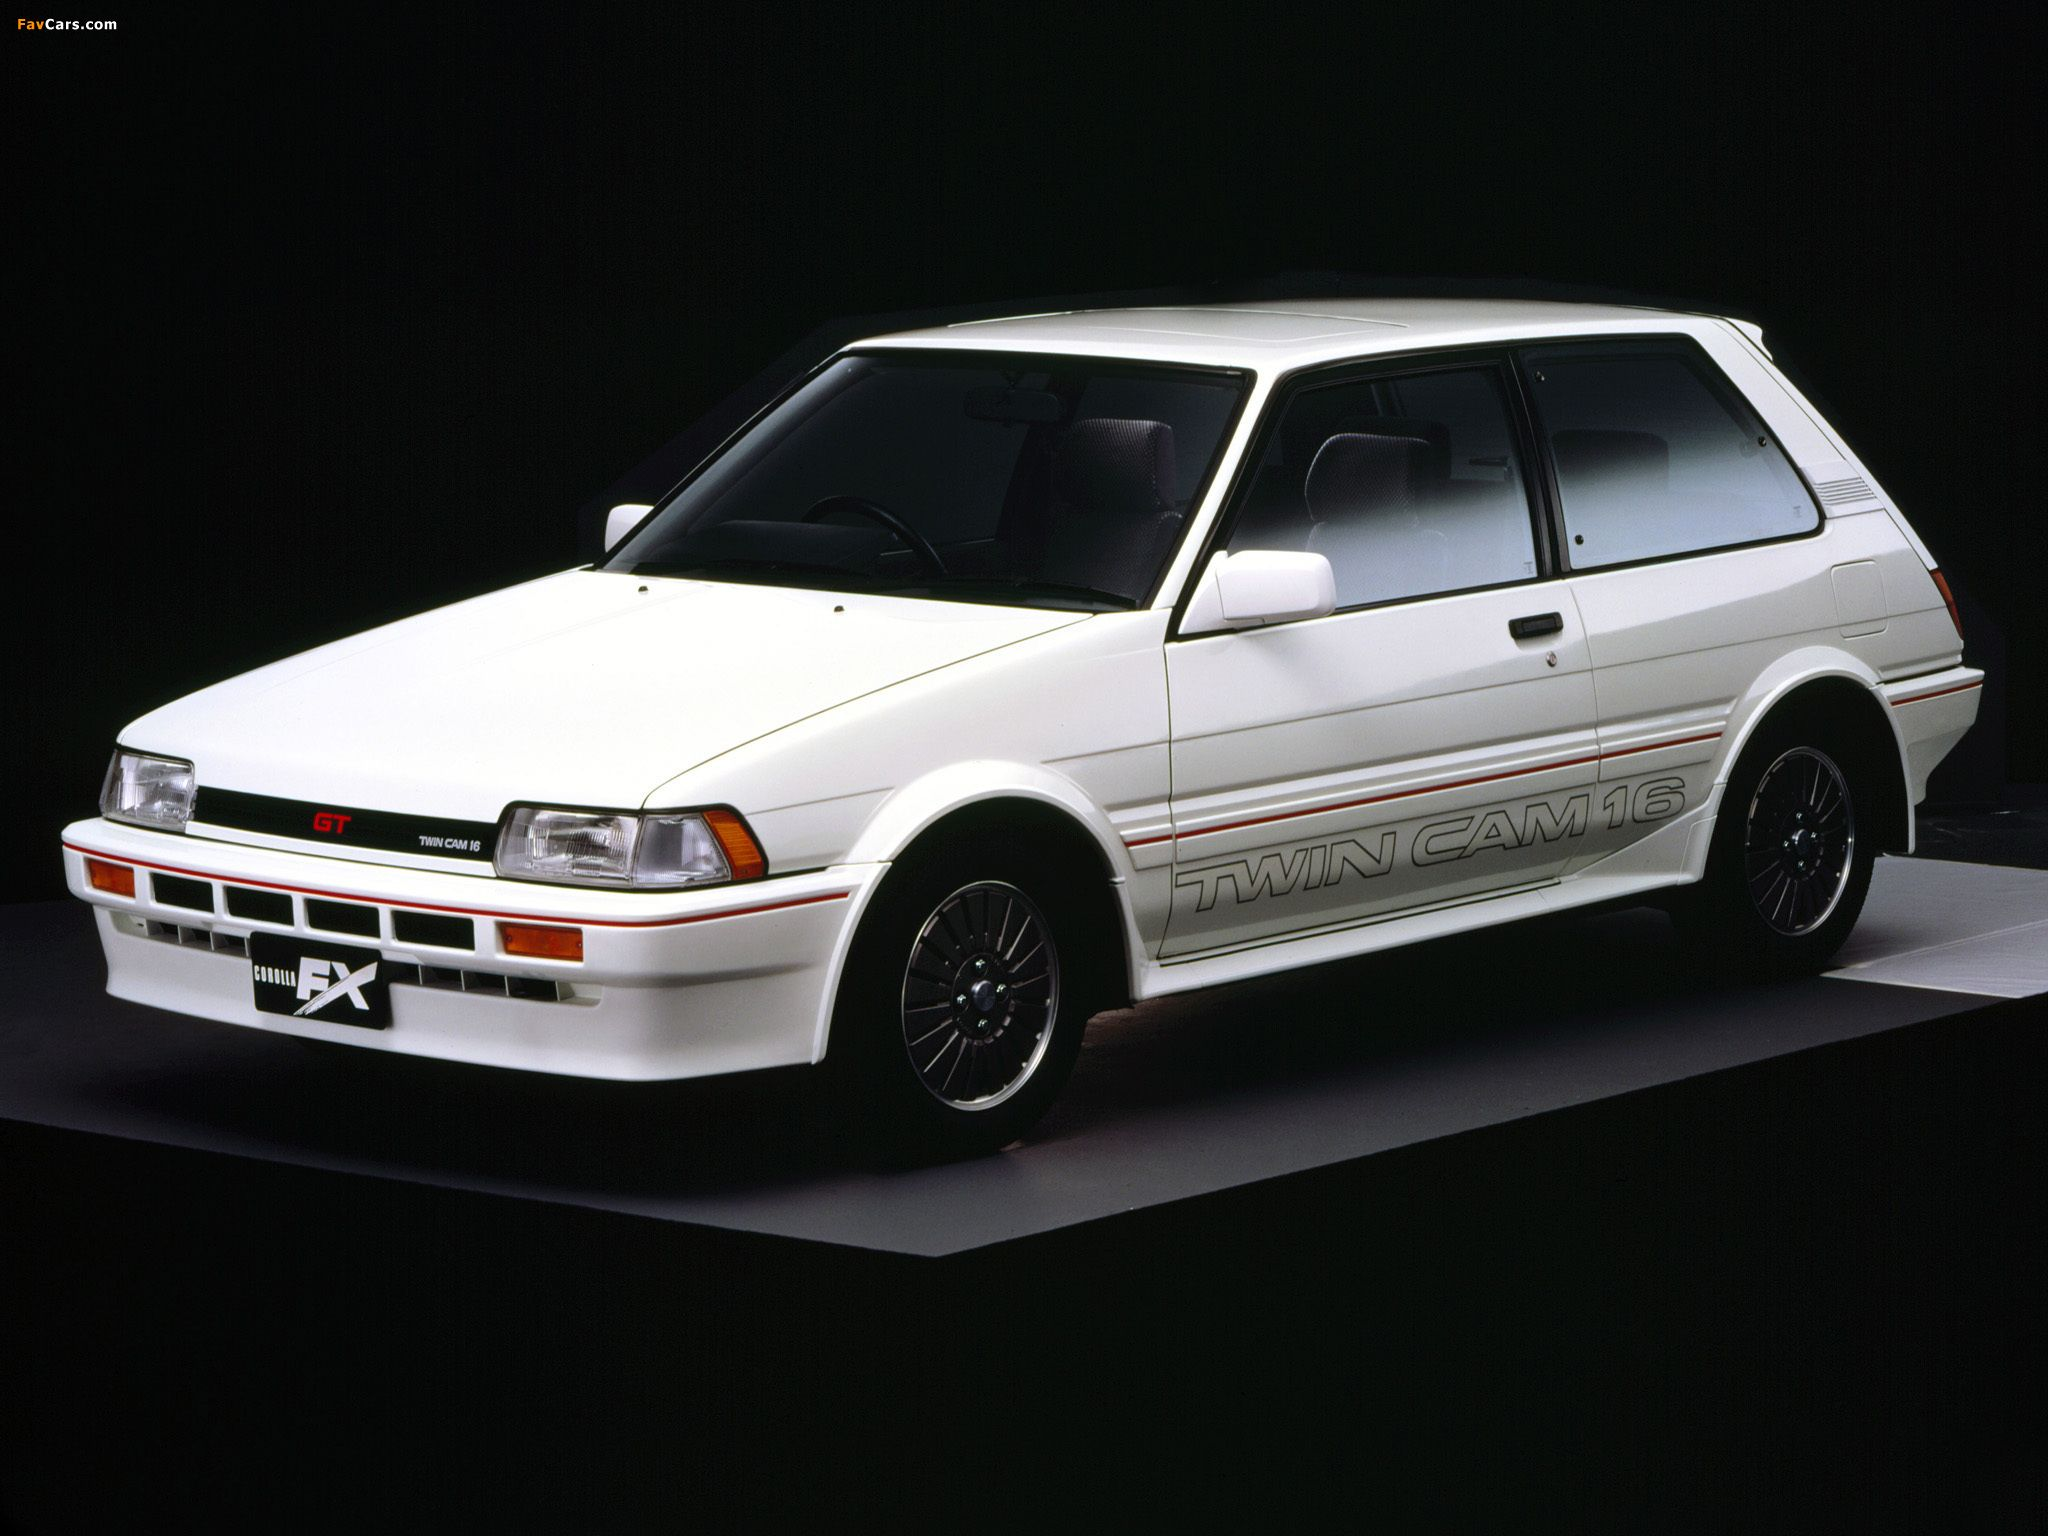 Toyota corolla fx gt e80 1983 87 pictures 2048 x 1536